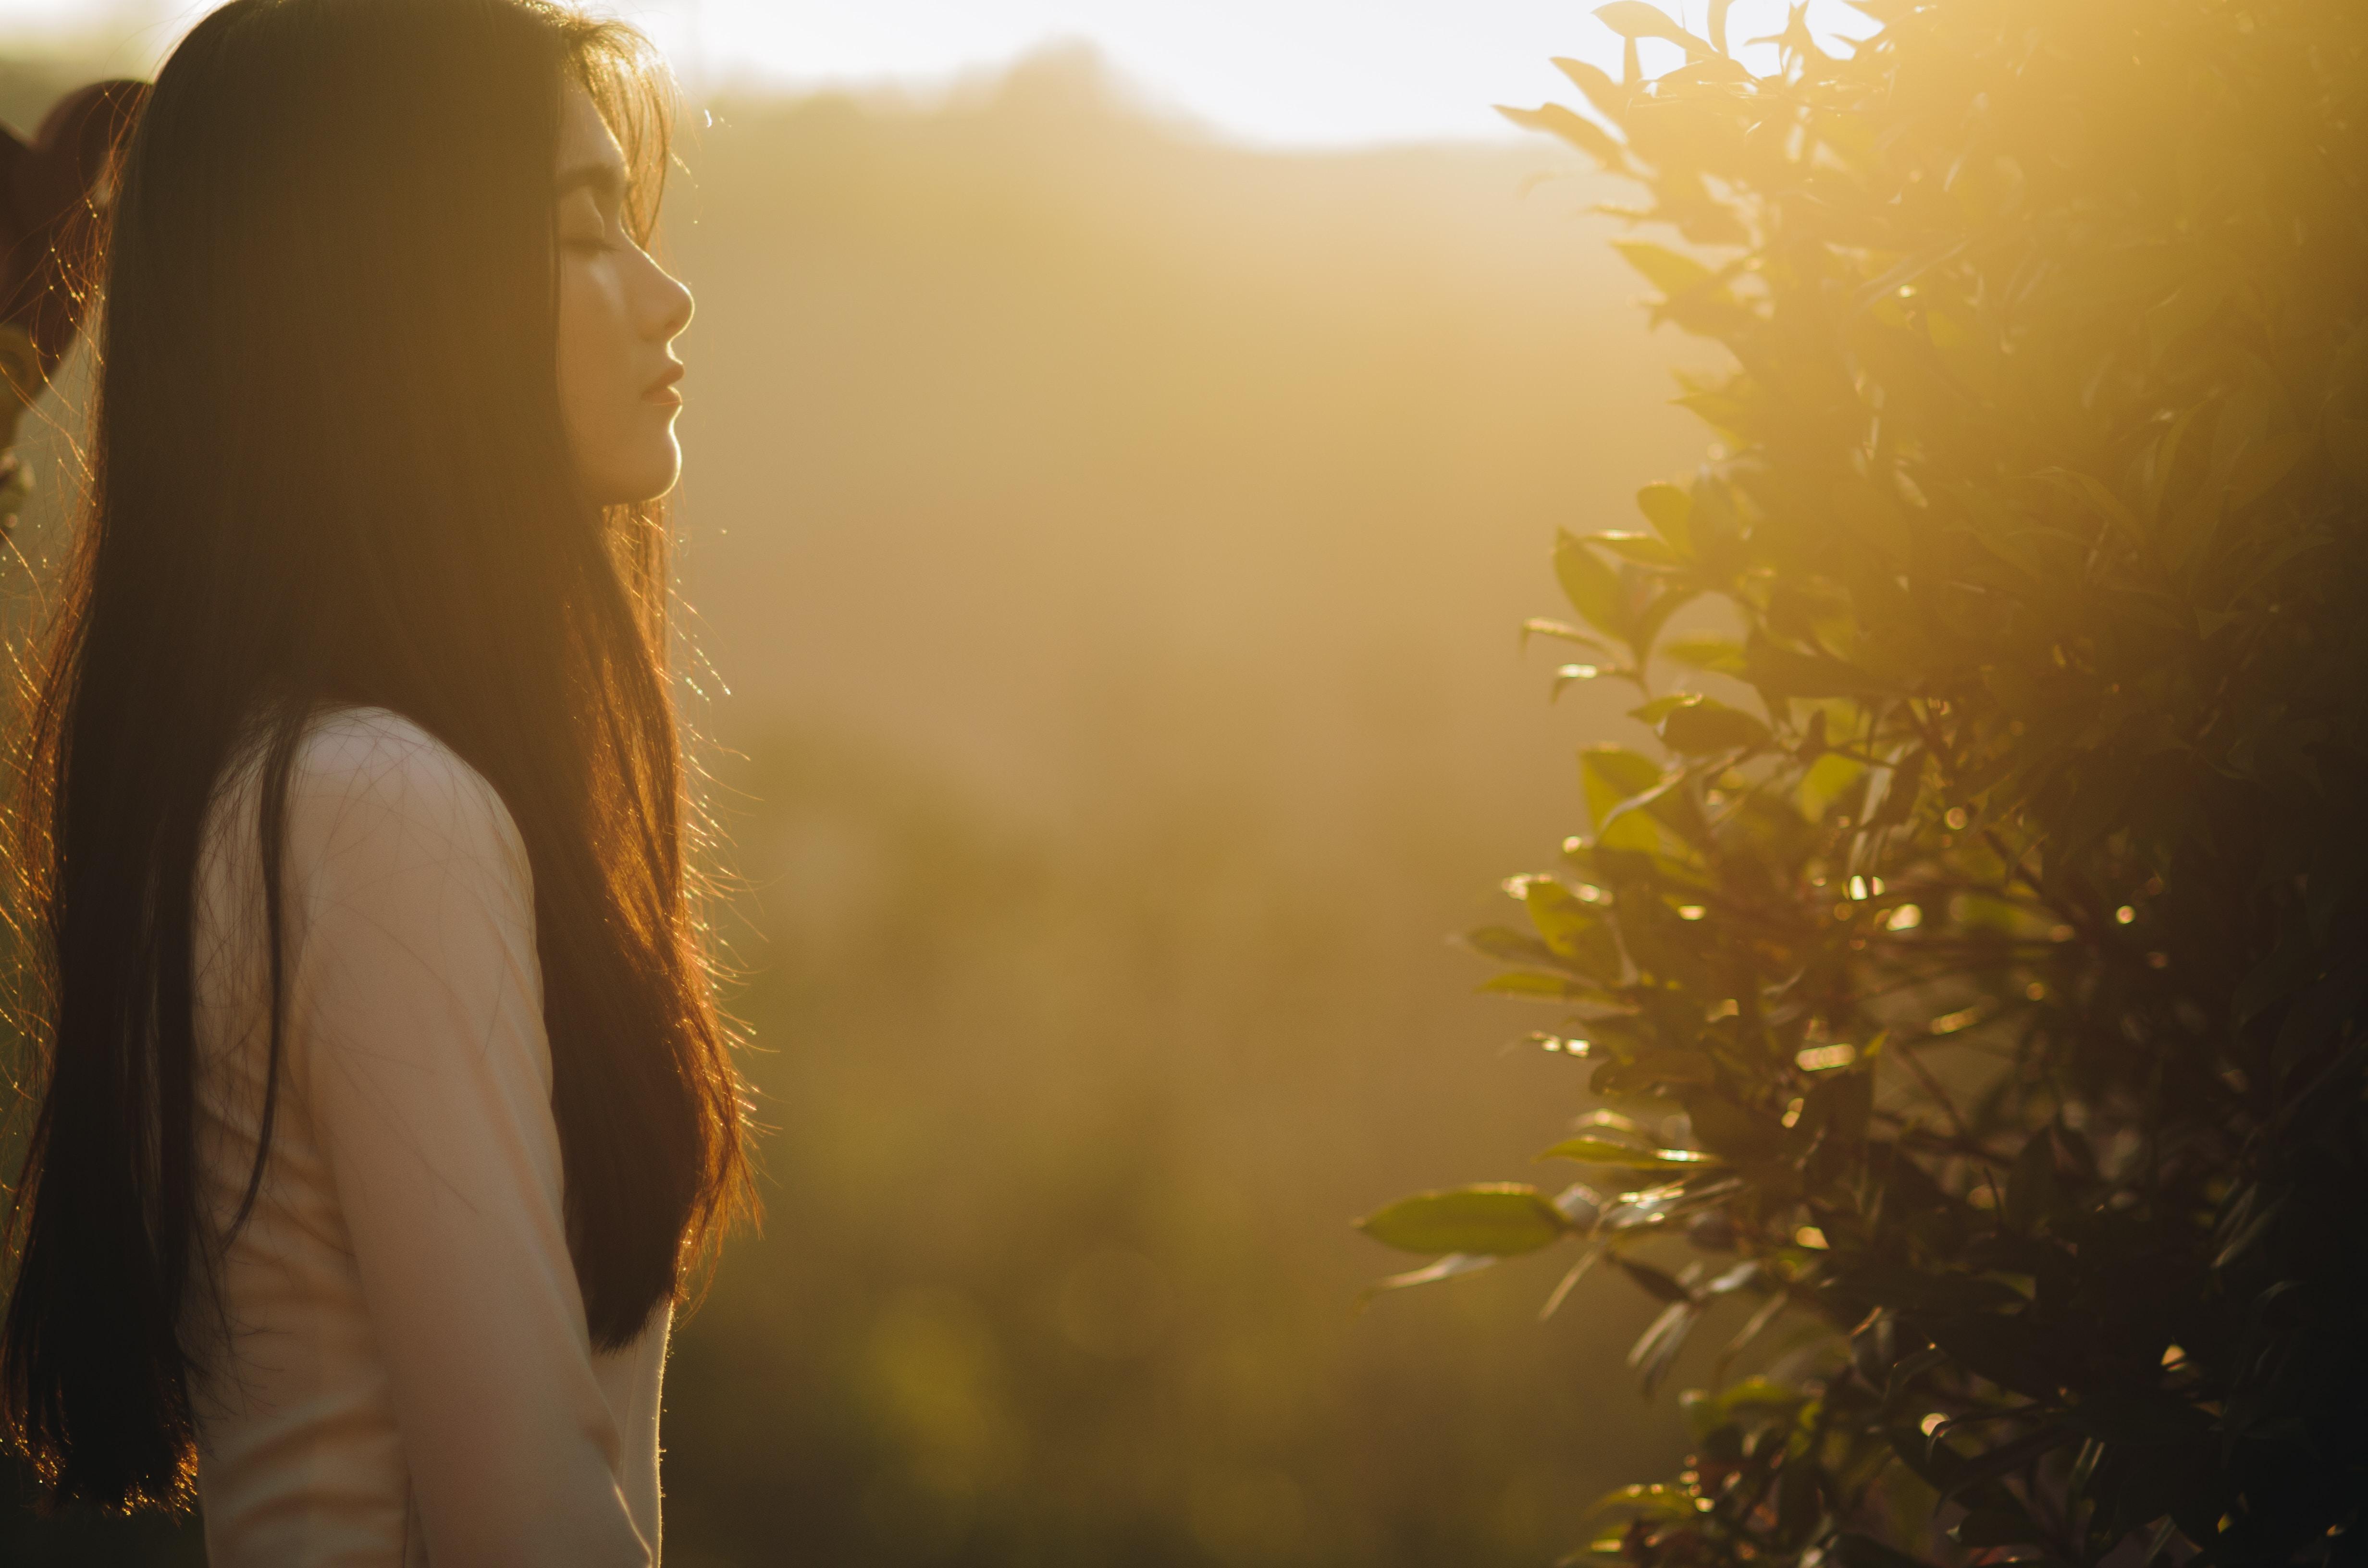 woman in brown shirt enjoying the sunrise